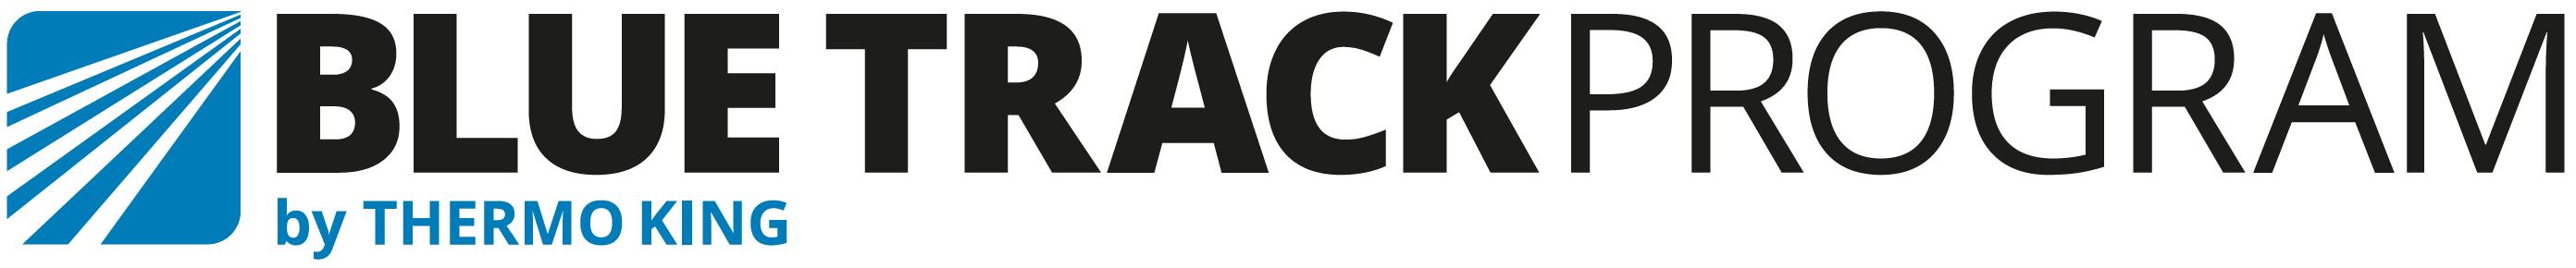 Blue Track Service Händler Programm